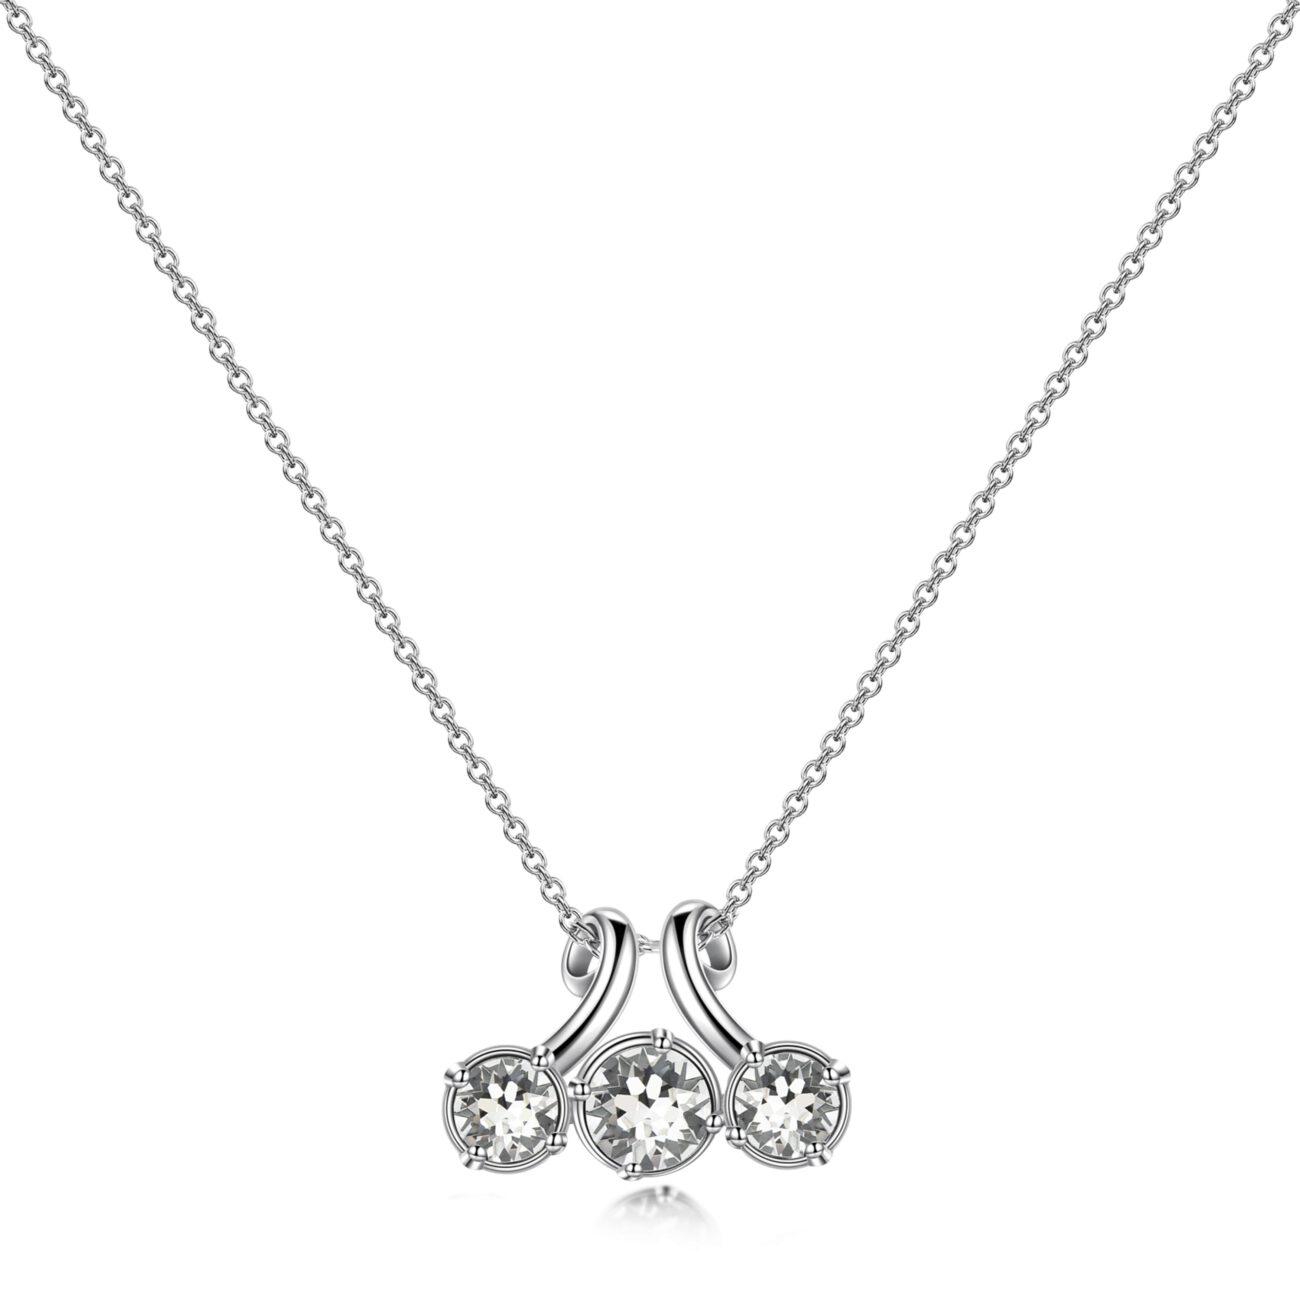 Rhodiated brass necklace and white Swarovski©crystals